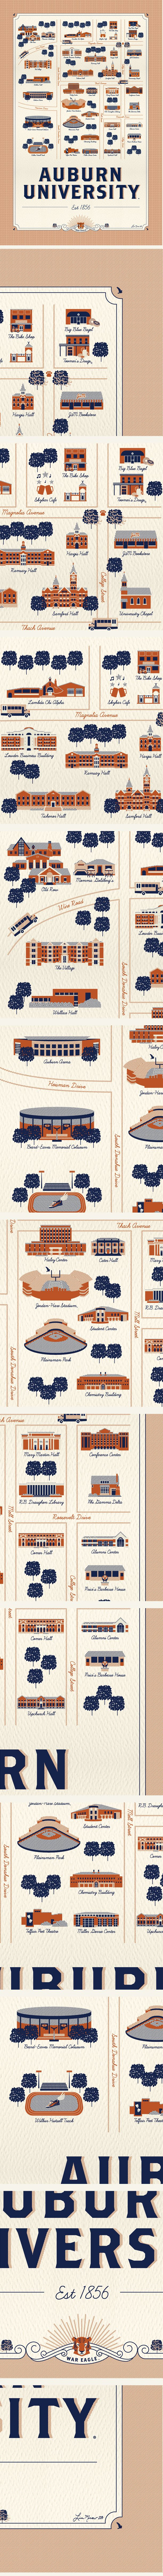 Auburn Map made by an Auburn Grad